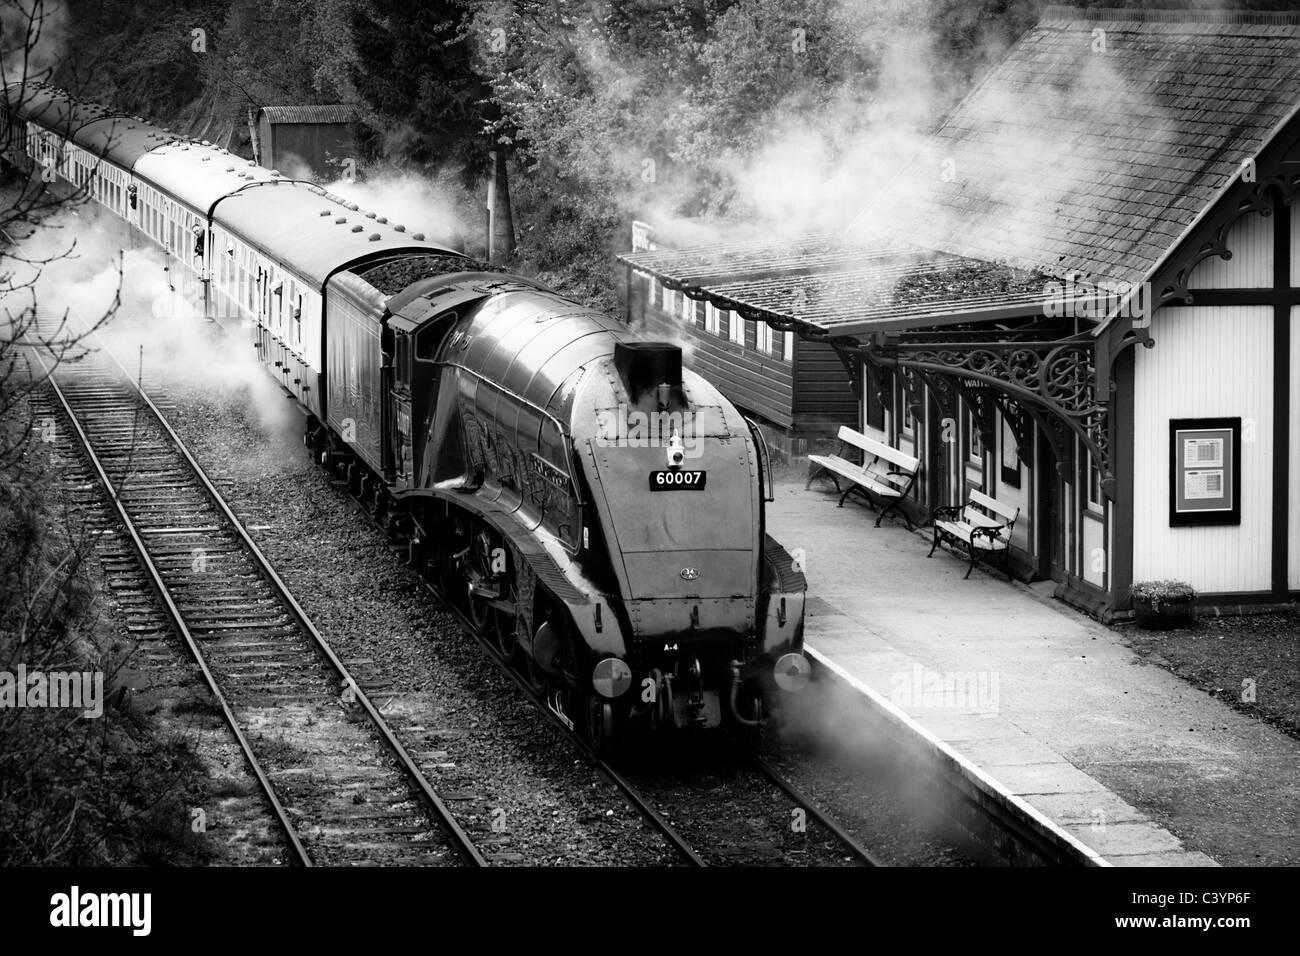 Sir Nigel Gresley departs Birkhill Station - Stock Image